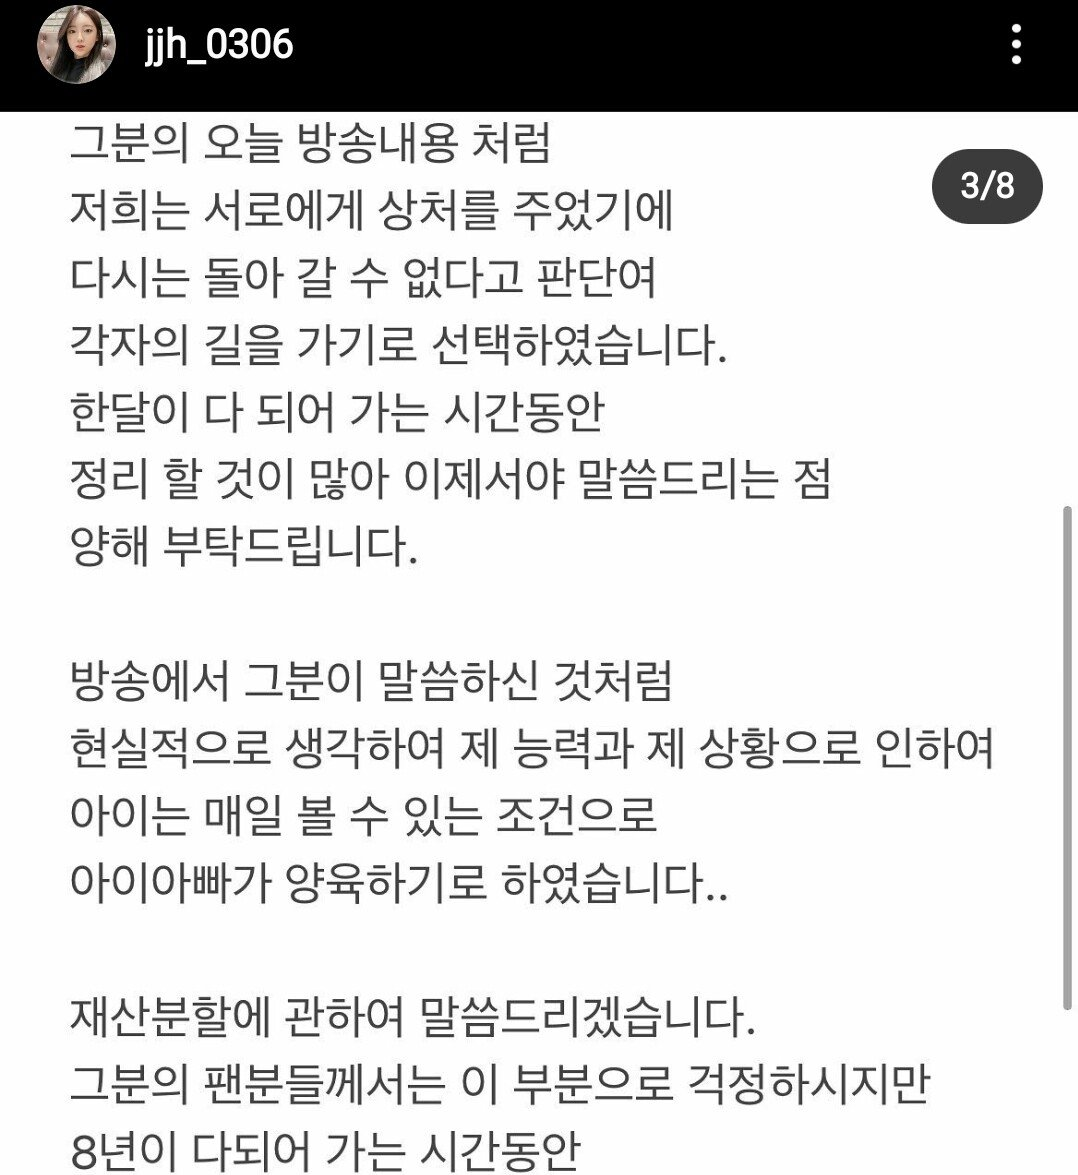 Screenshot_20210616-013125_Instagram.jpg [스압] BJ외질혜 인스타 피드사진 업로드....jpg